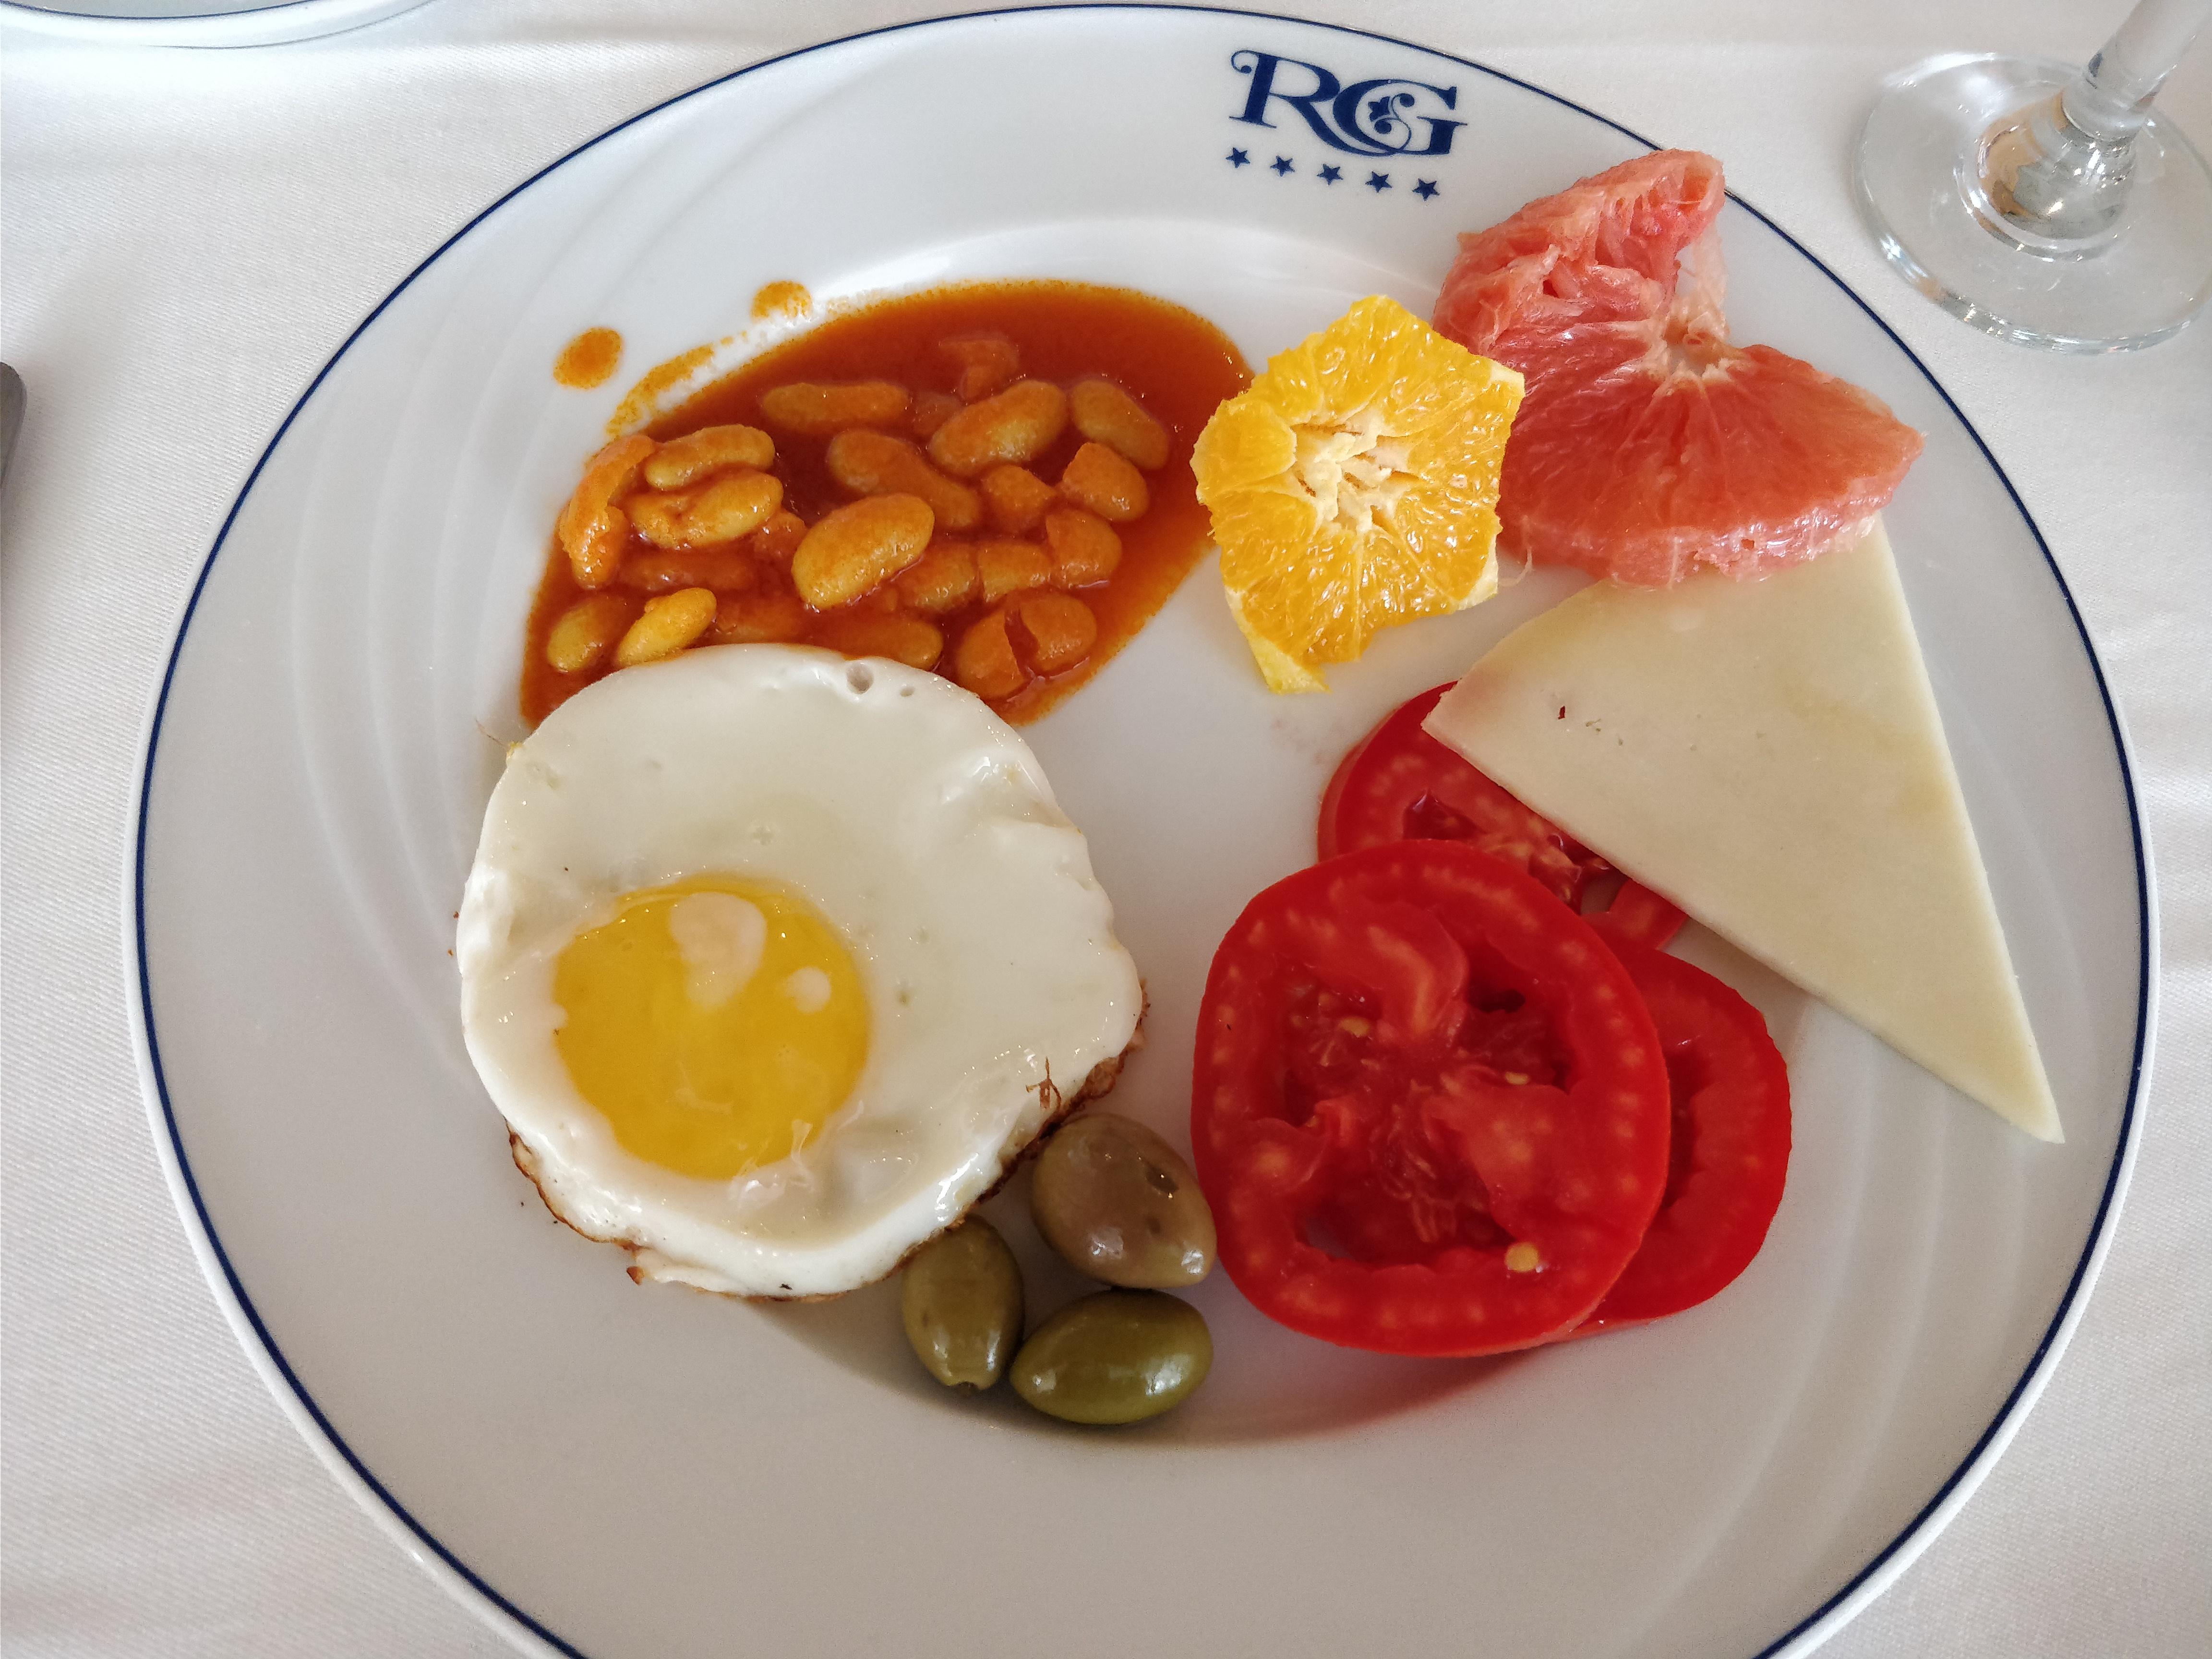 https://foodloader.net/nico_2017-08-12_royal-garden-palace-fruehstueck-1.jpg